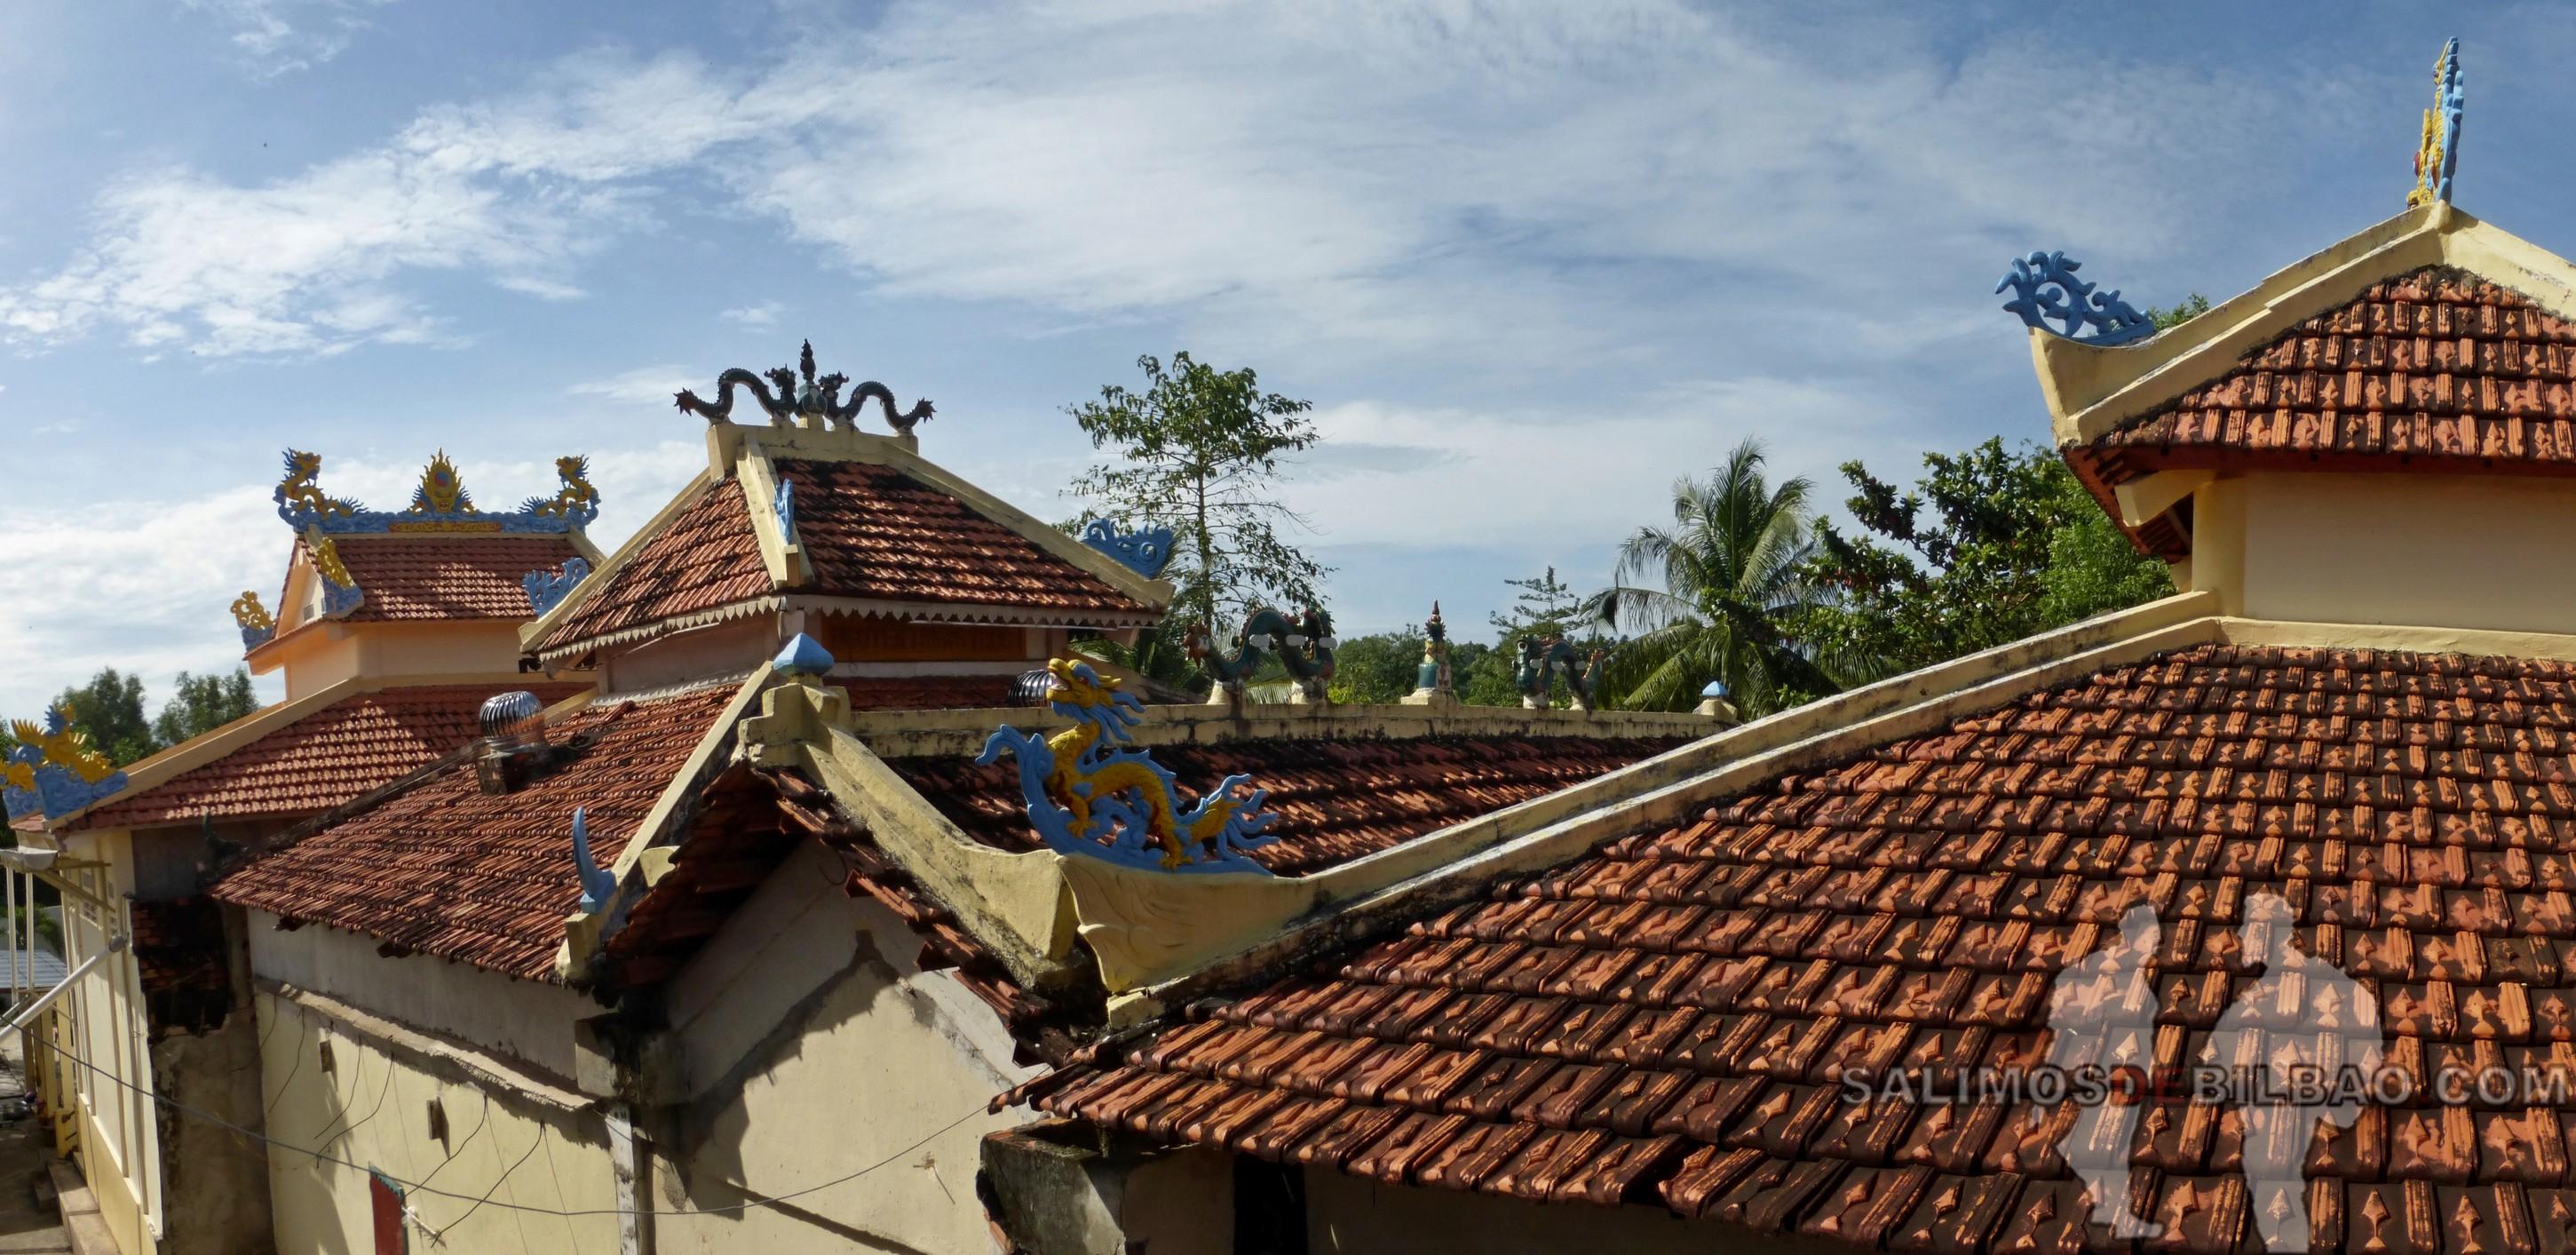 0131. Pano, Pagoda Dinh Nguyen Trung Truc, Noreste de Phu Quoc